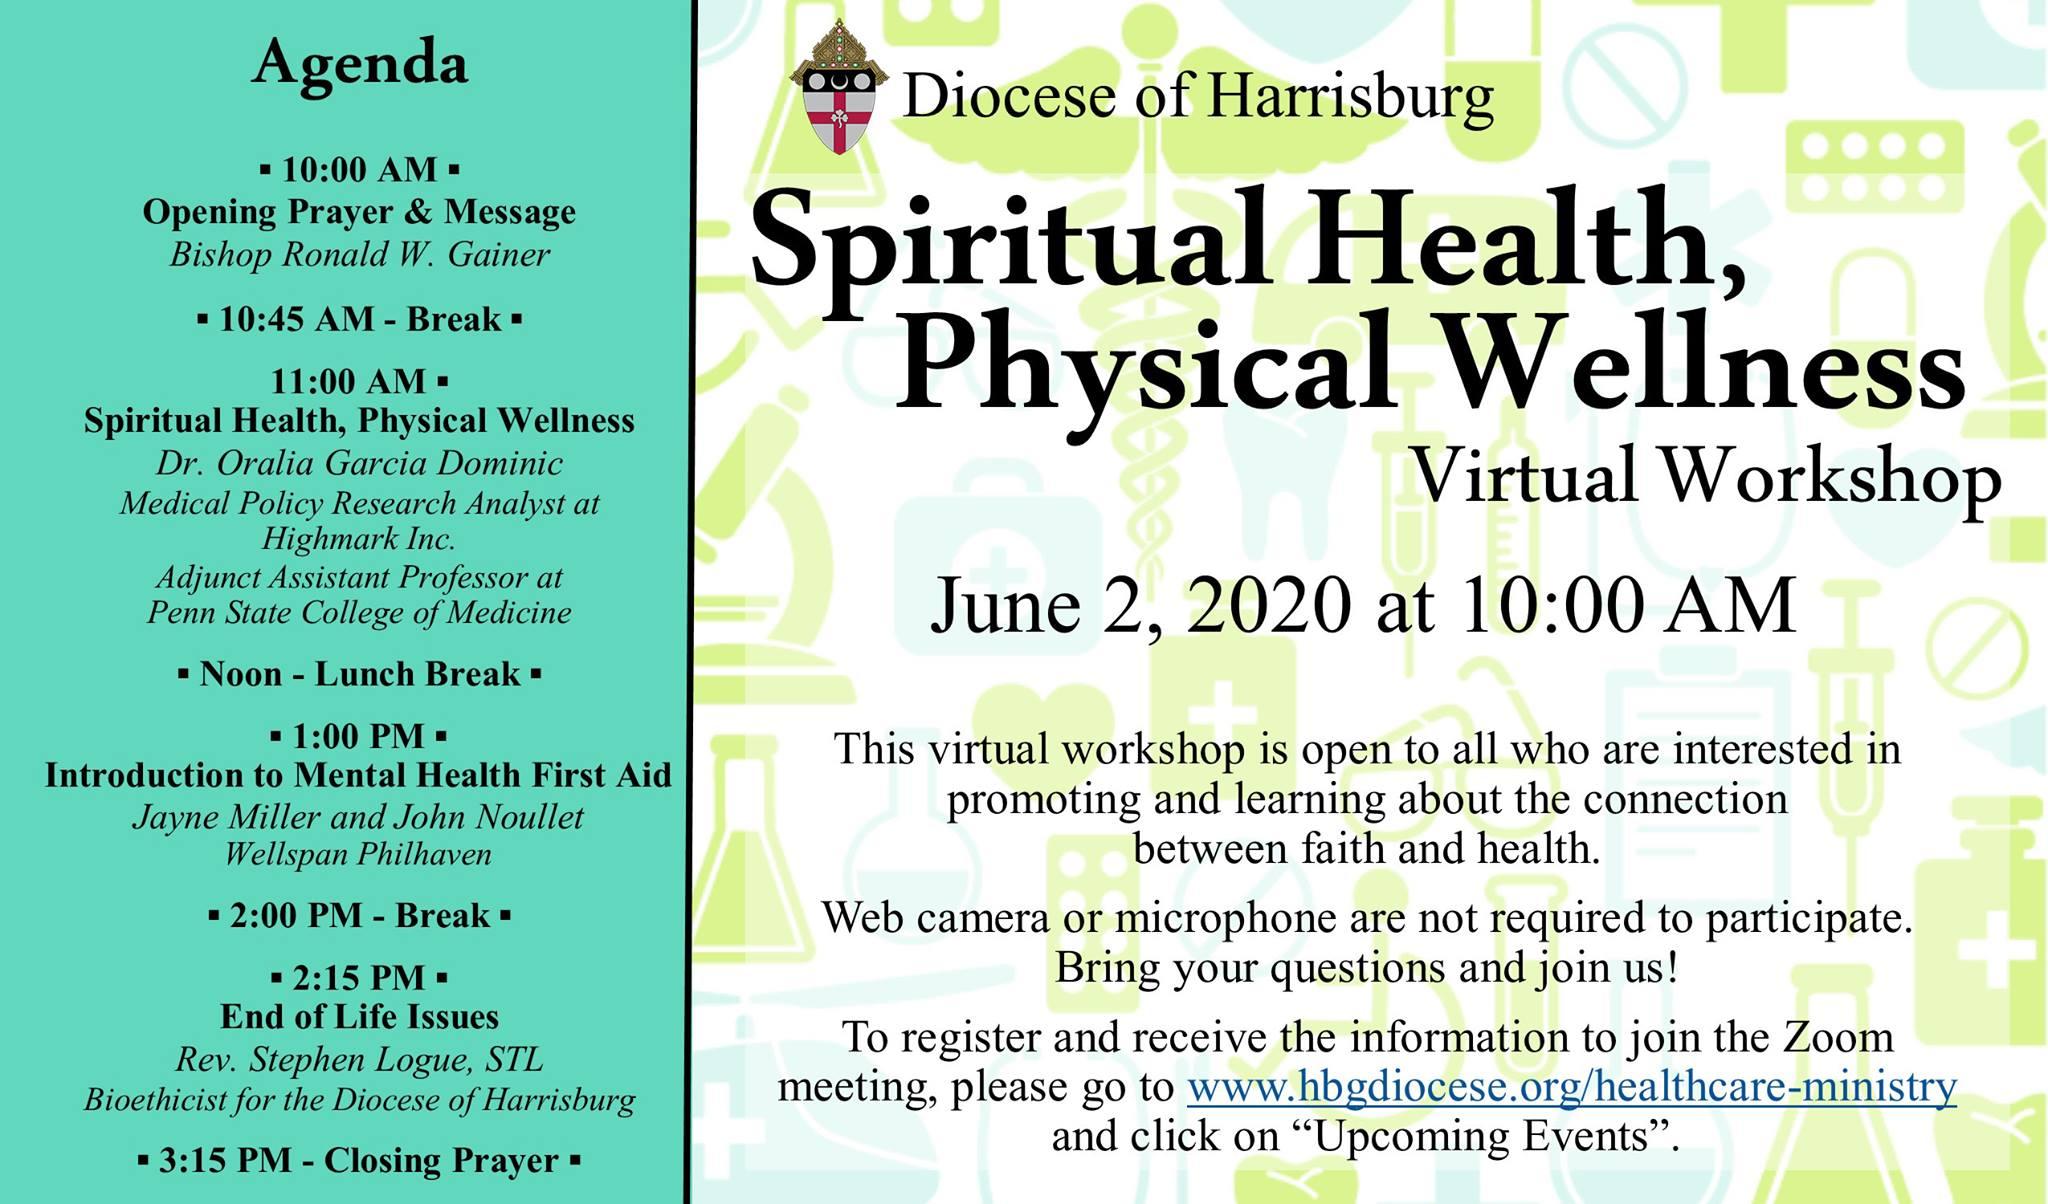 Spiritual Health Physical Wellness Virtual Workshop